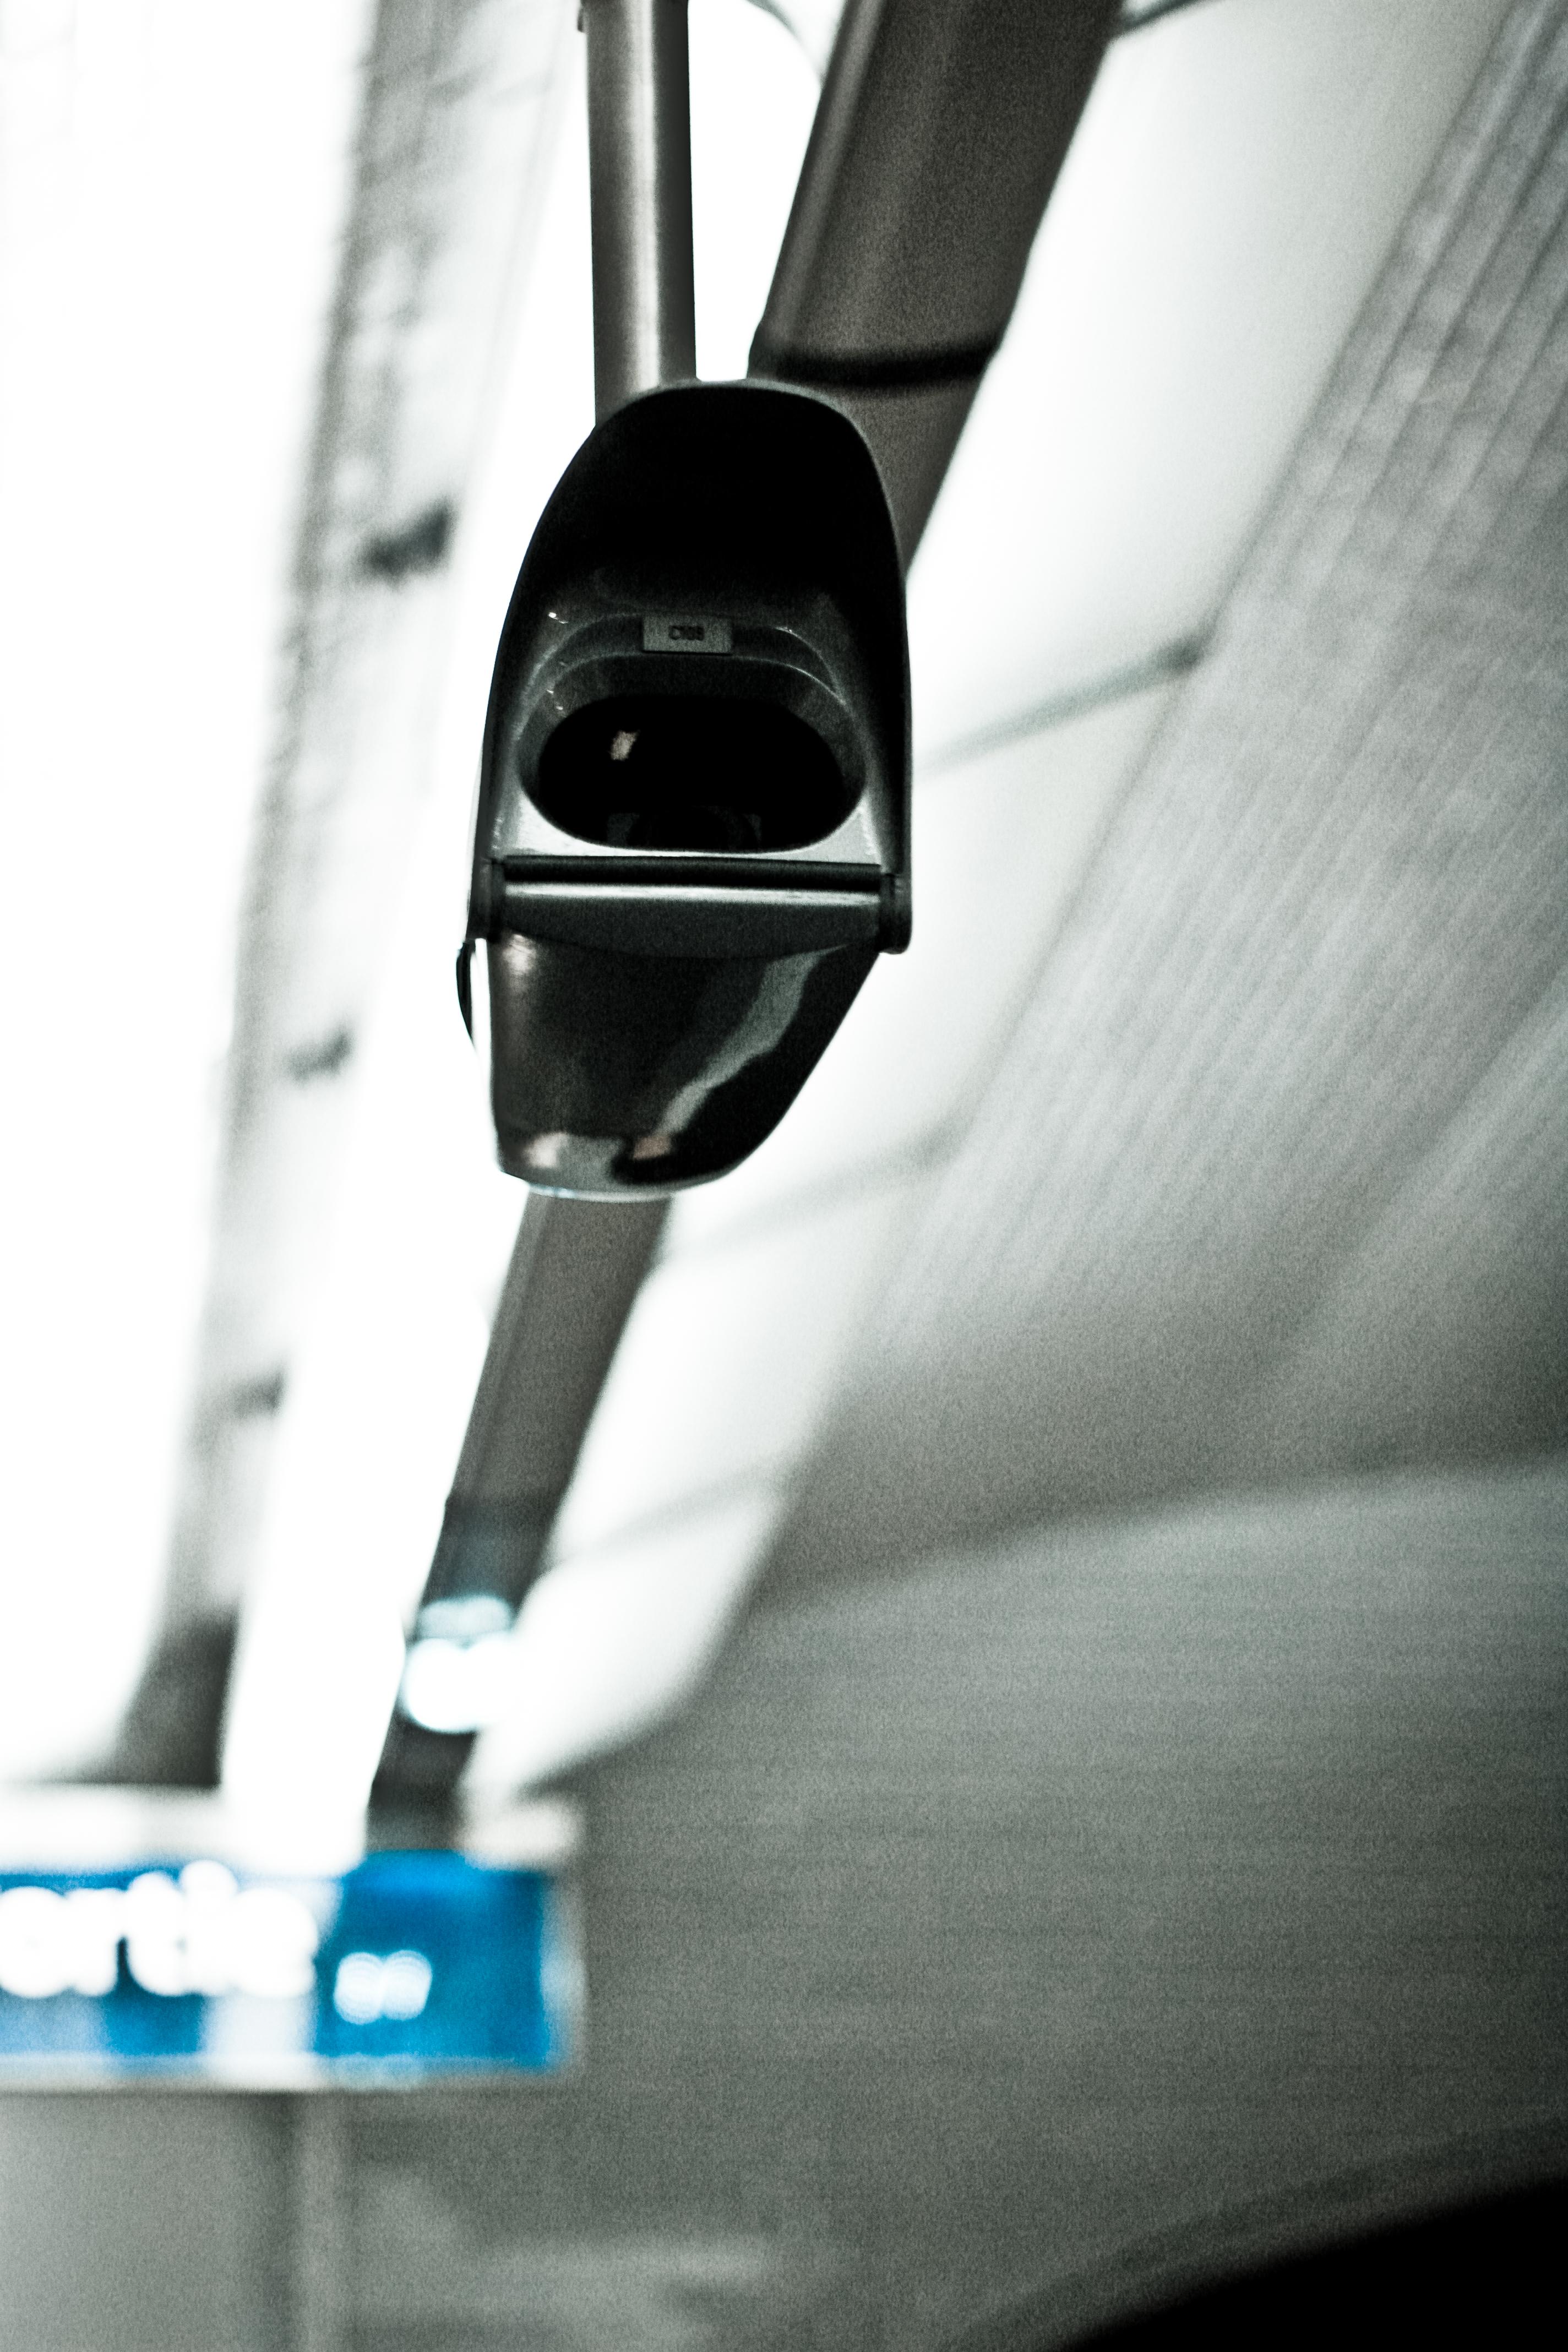 panneau camera de surveillance